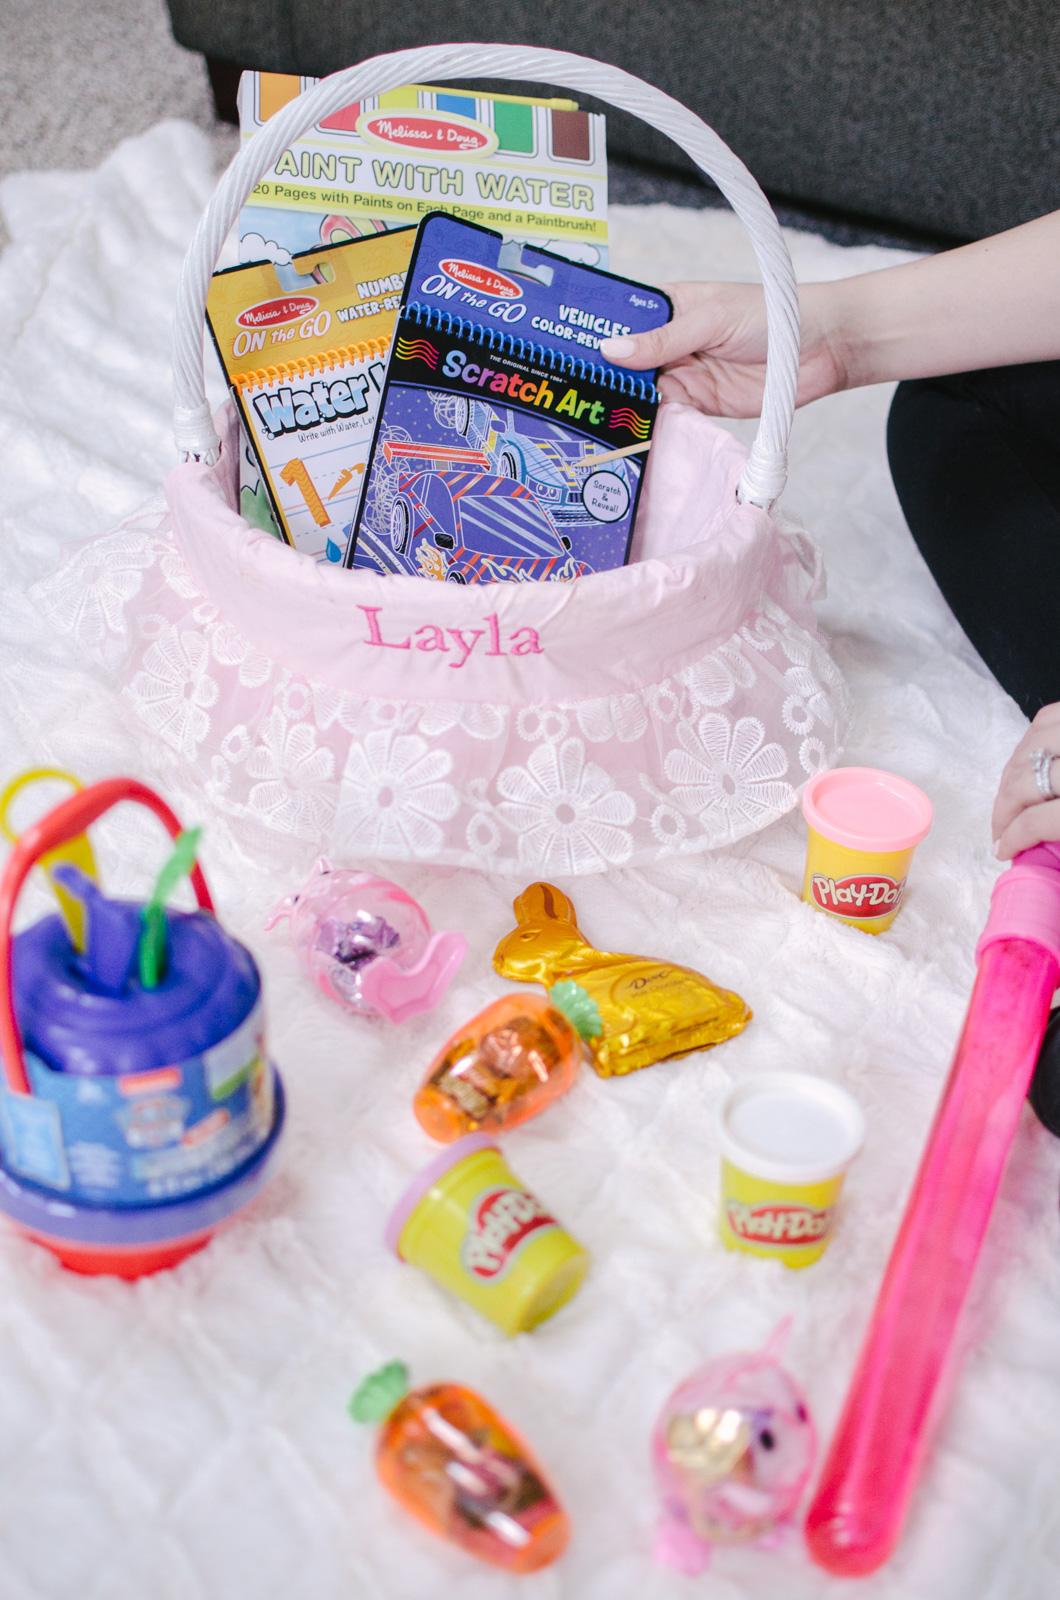 best toddler easter basket ideas on amazon prime. Gotta love 2-day shipping, right?! | bylaurenm.com